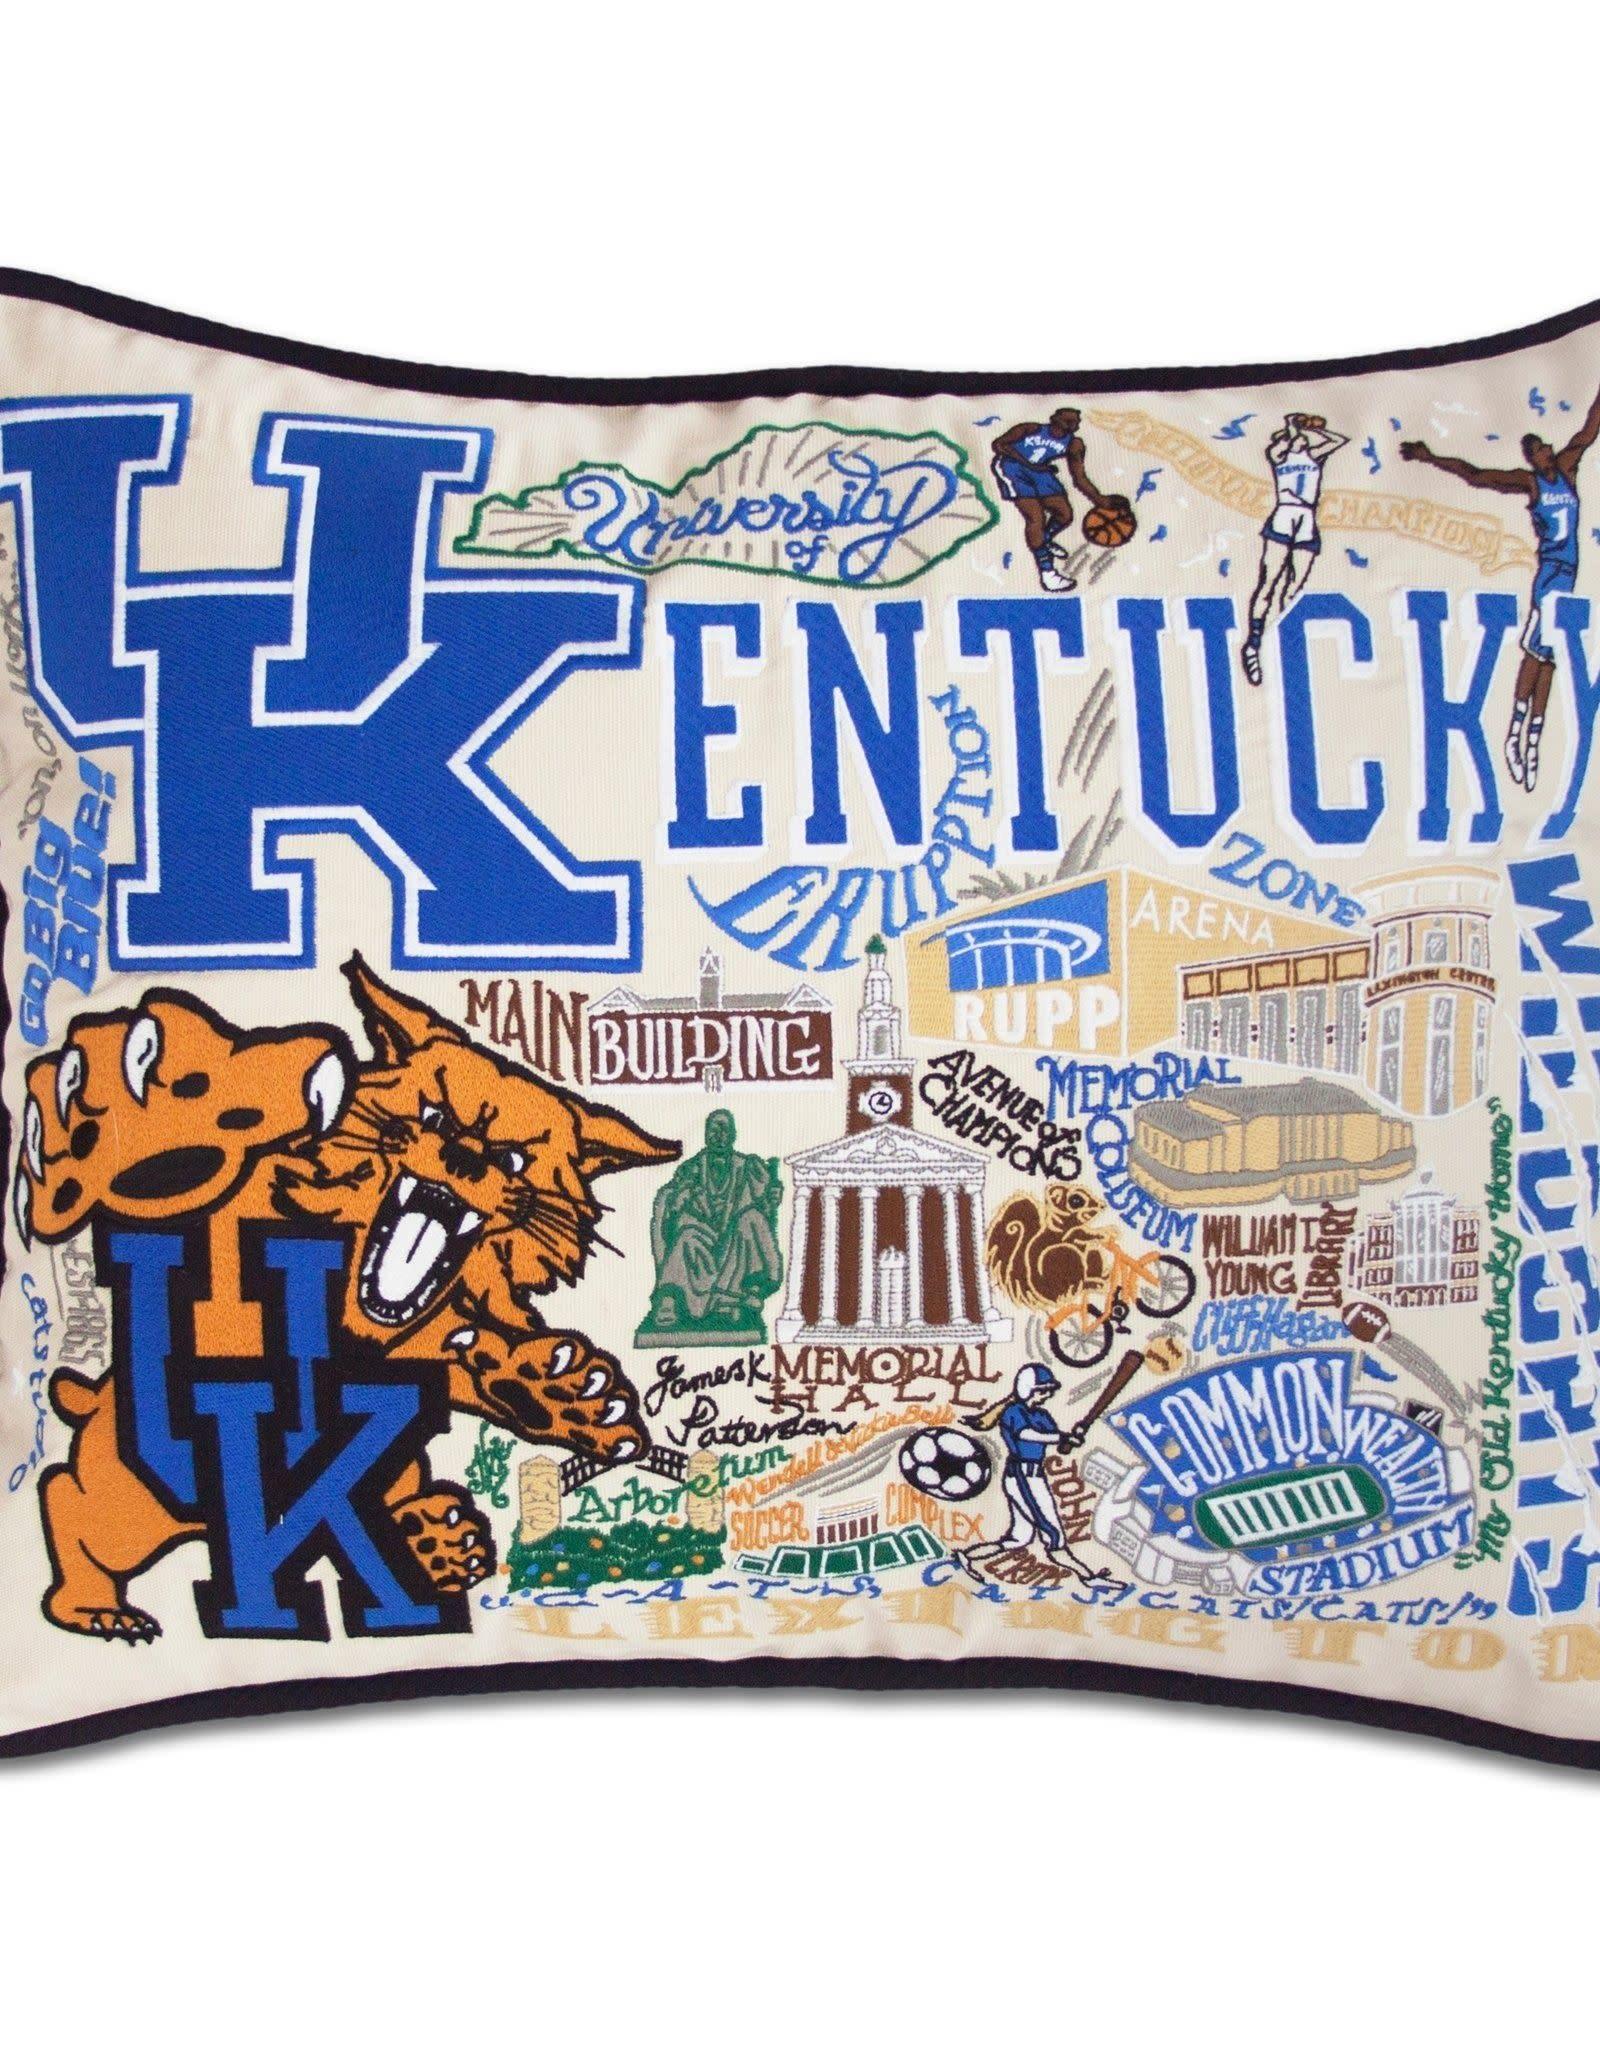 Catstudio Univeristy of Kentucky Pillow